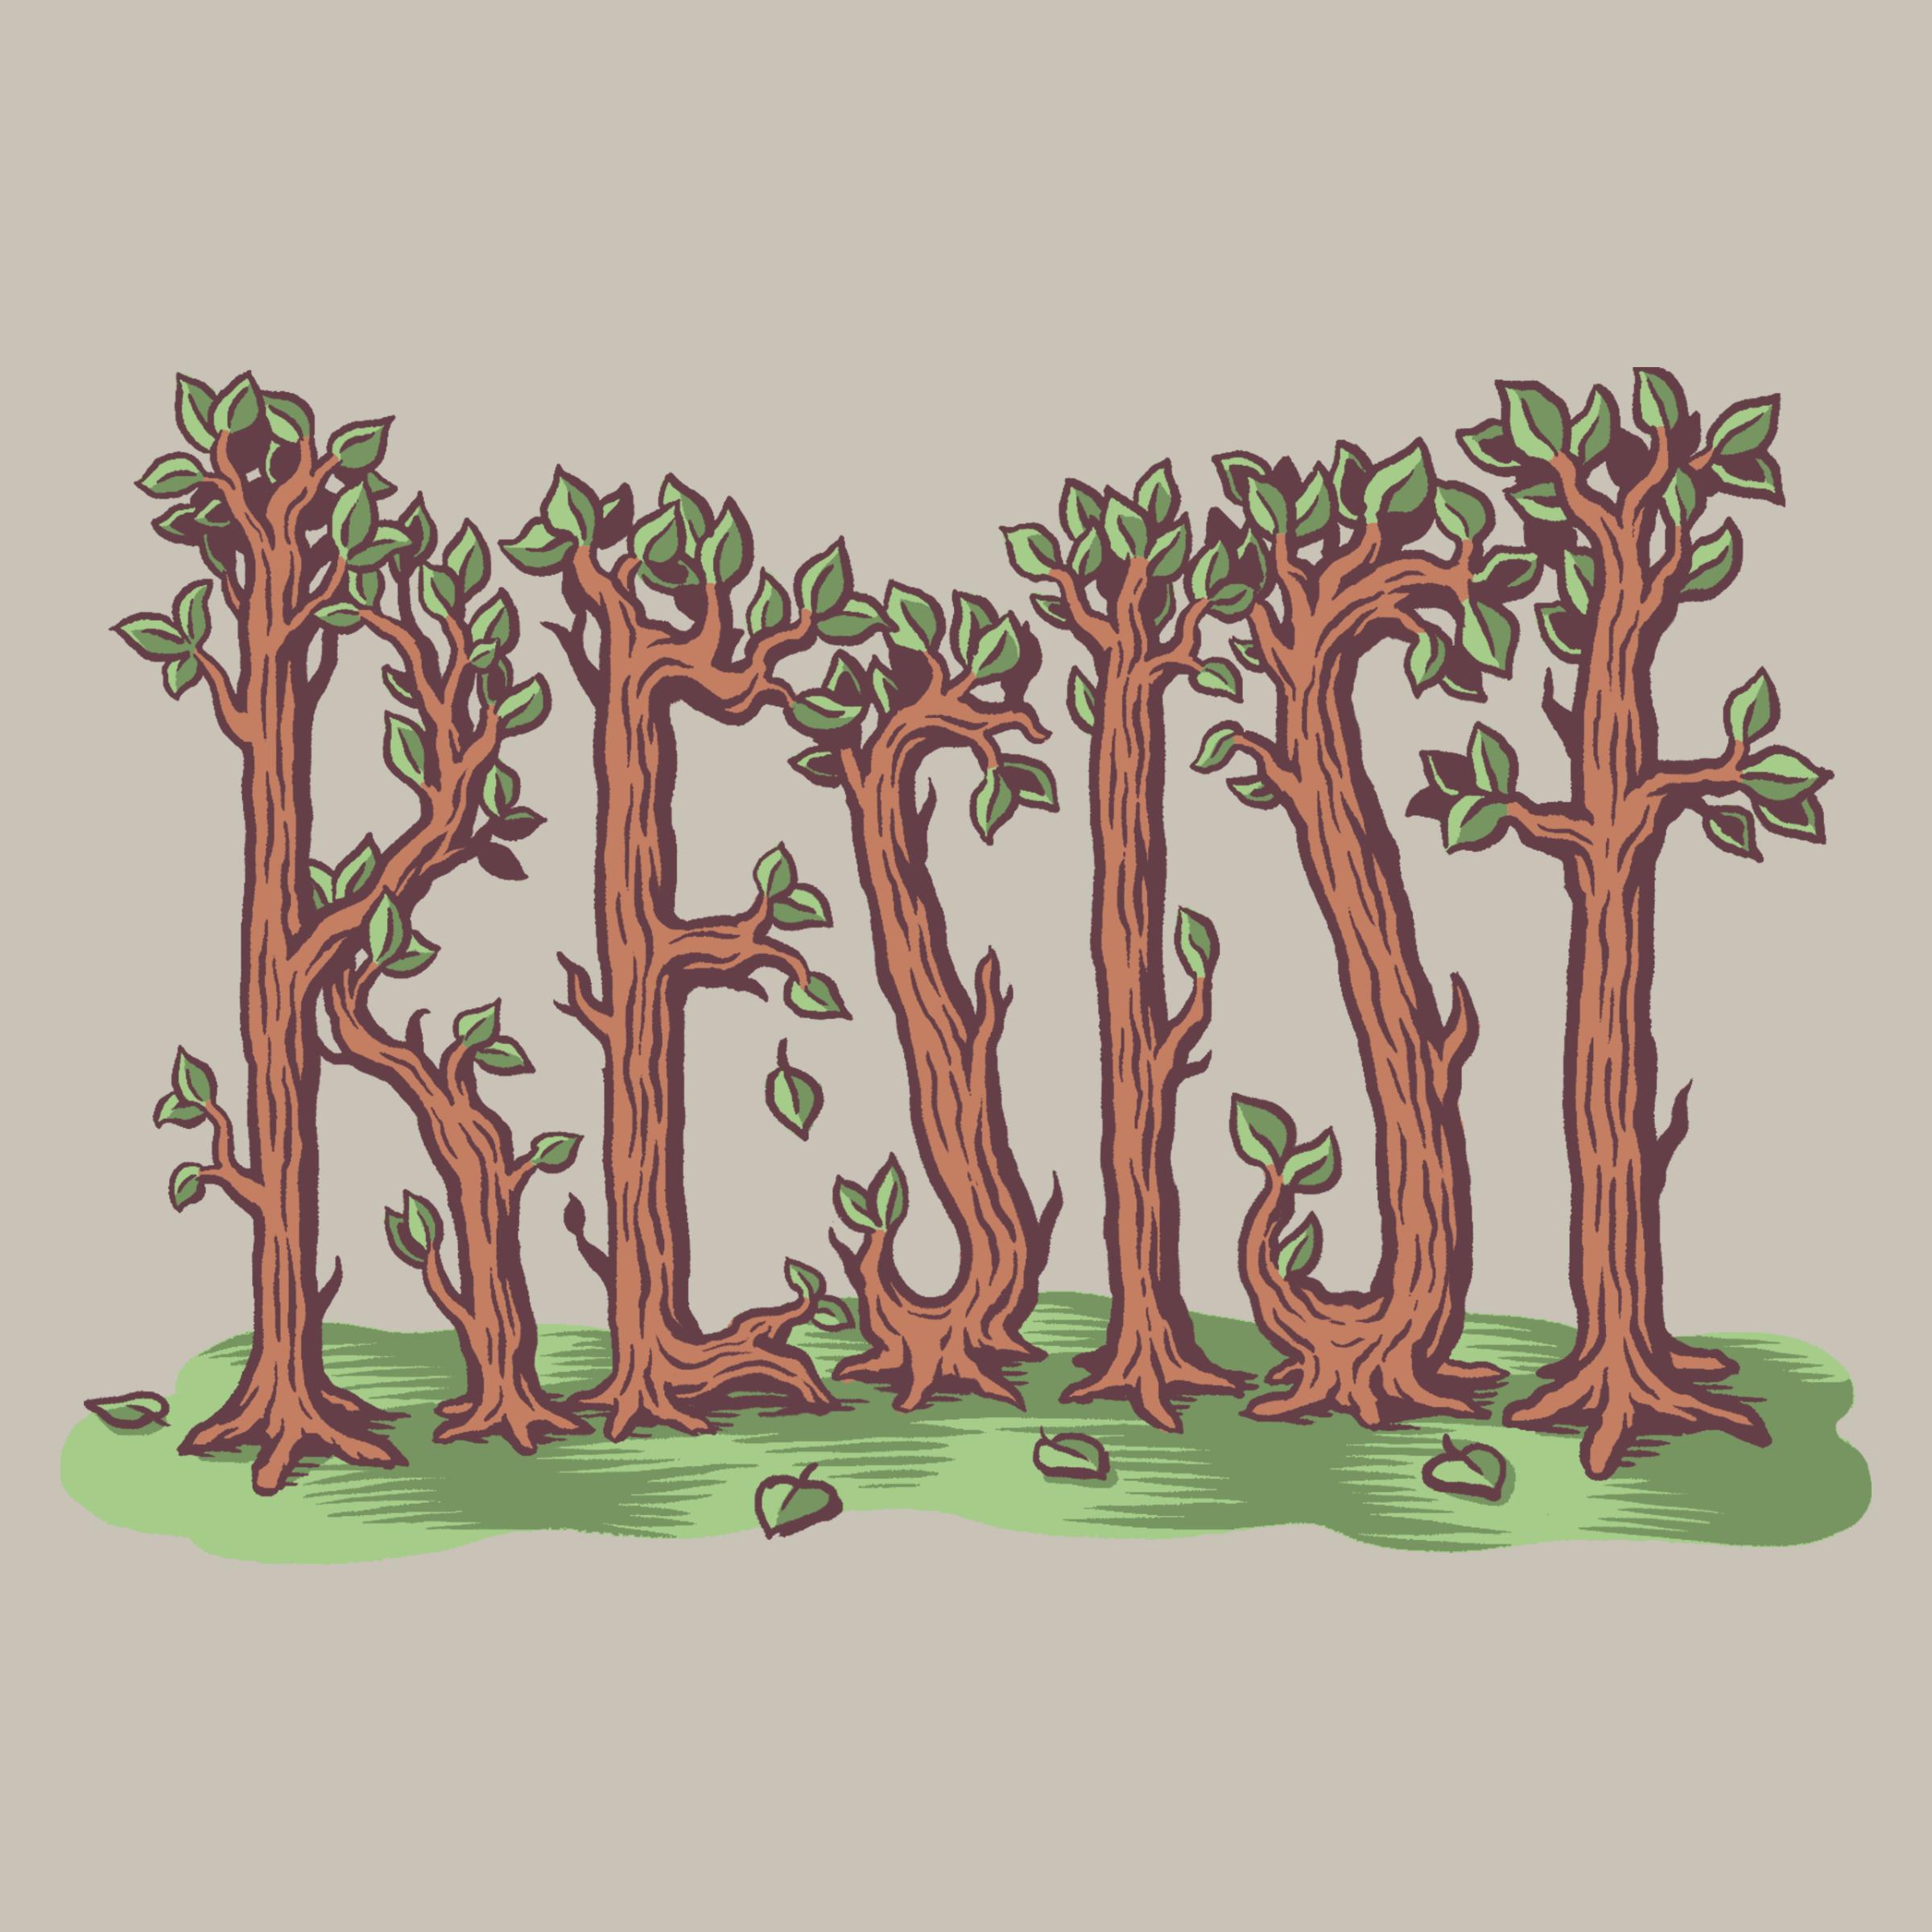 Resist Trees